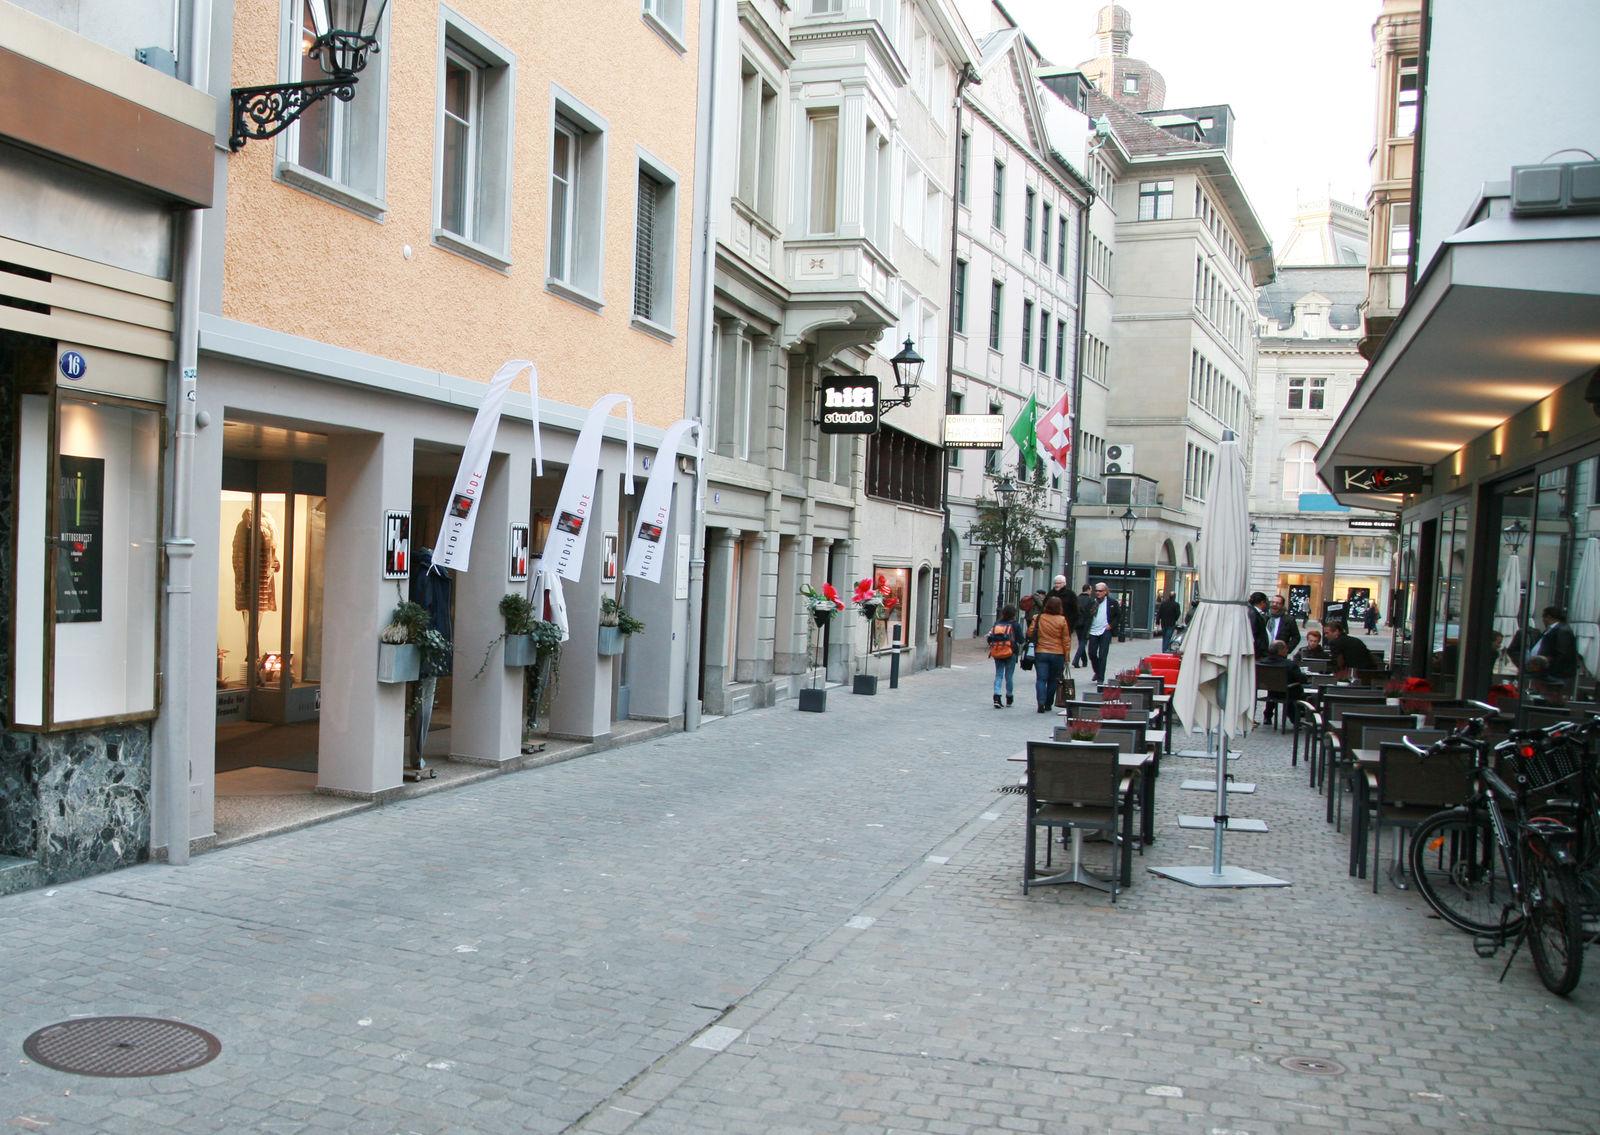 Heidis Mode - grosse Grössen in St. Gallen (Bild 3)